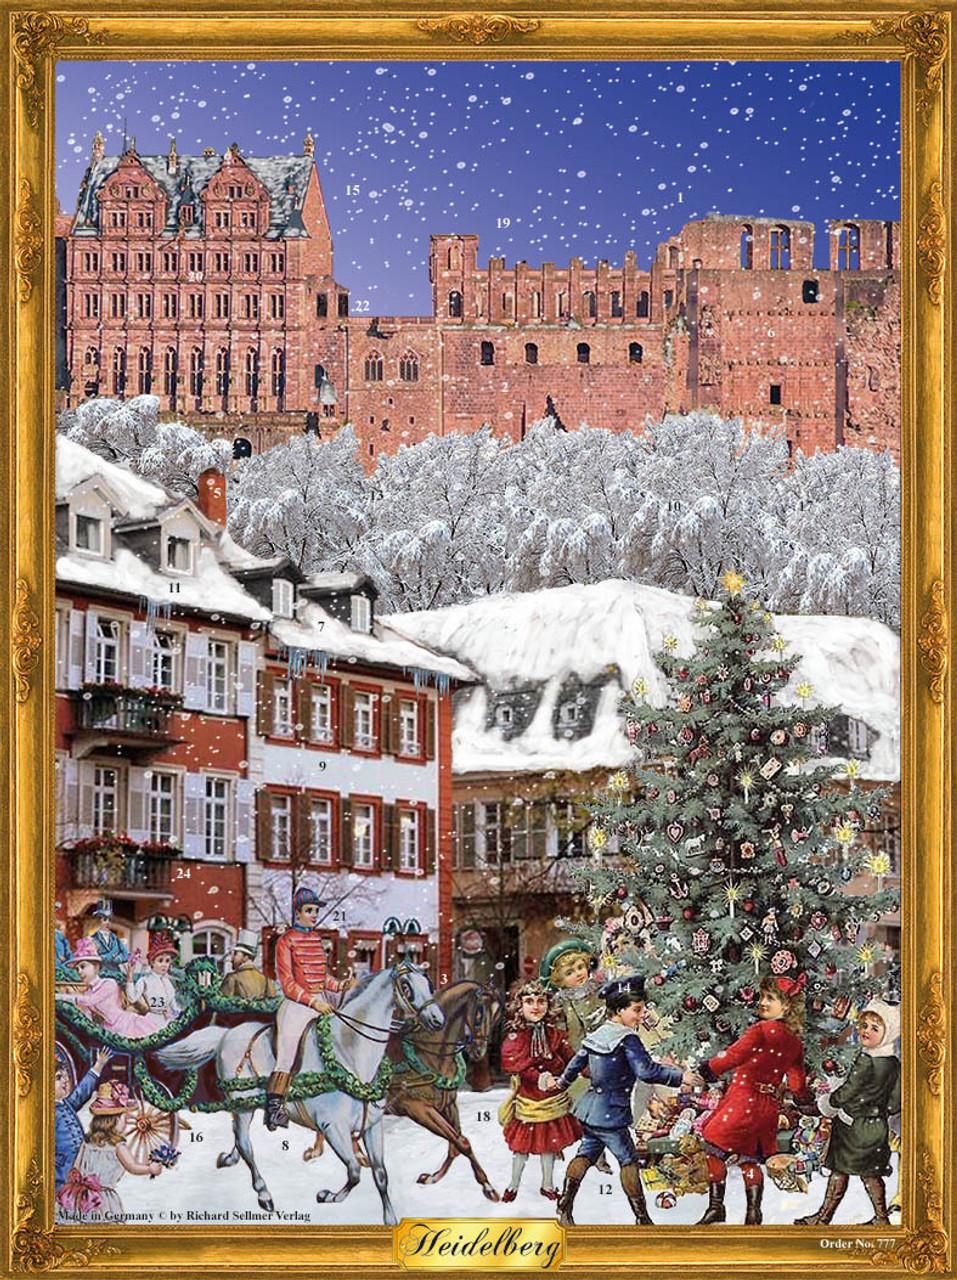 City of Heidelberg German Advent Calendar